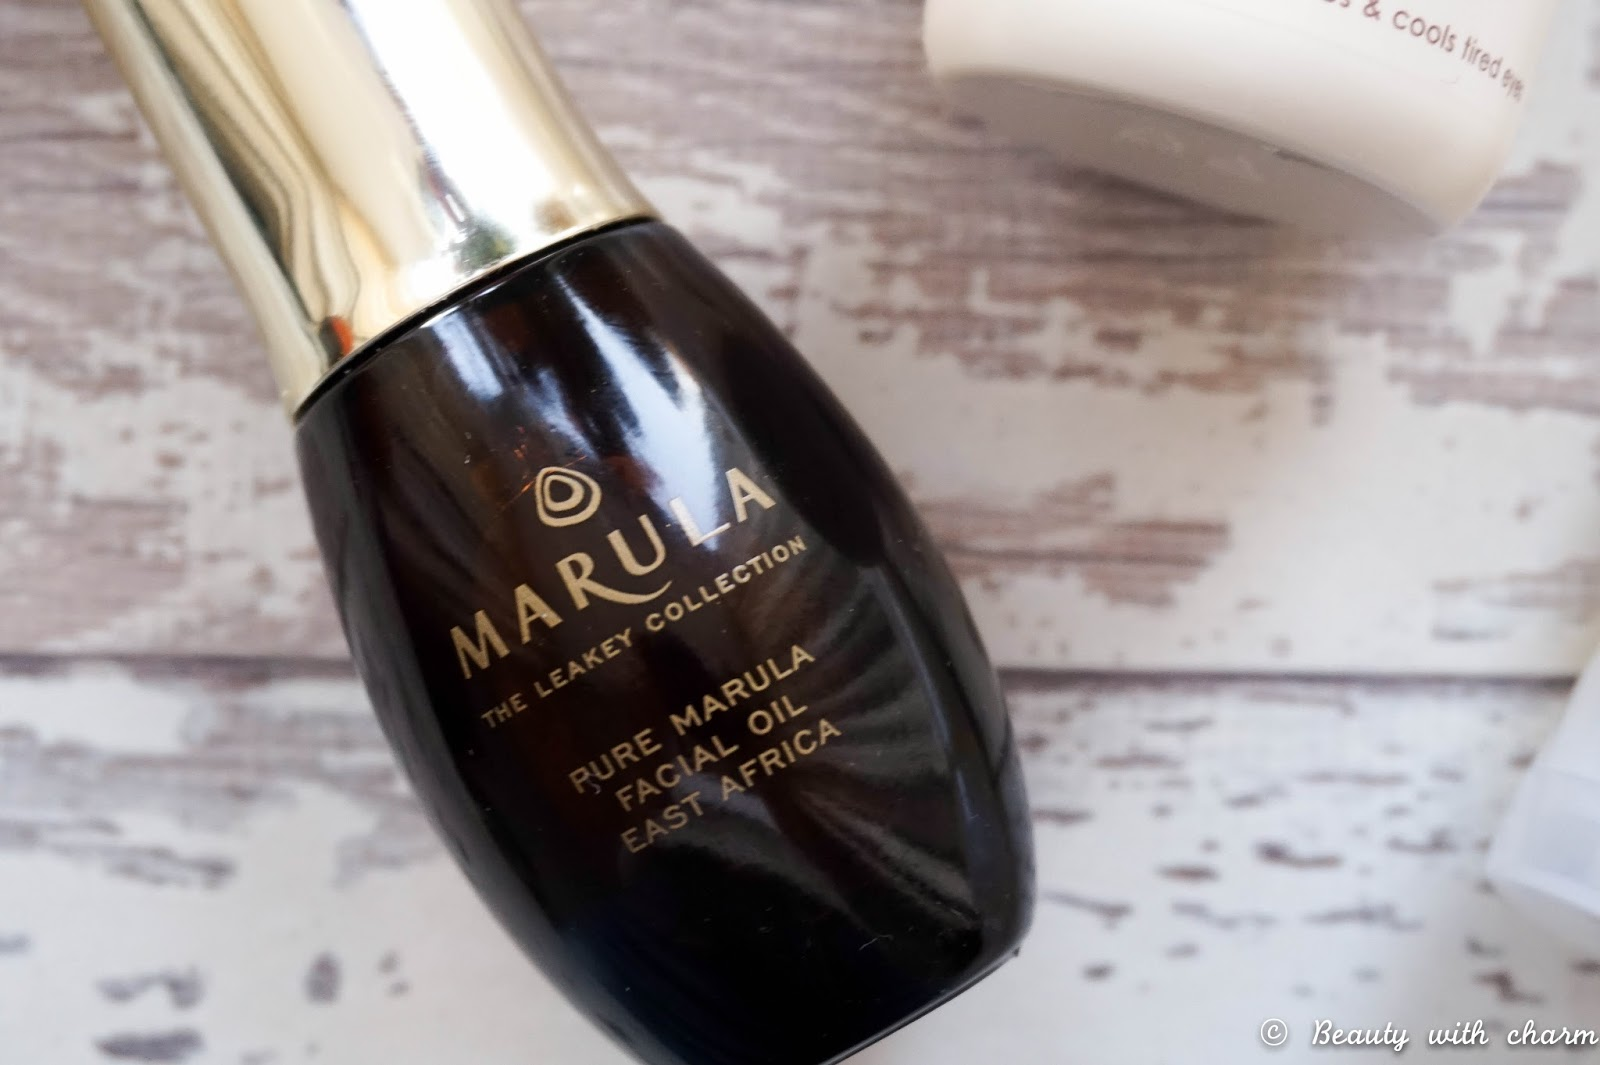 New Skincare Products - First Impressions, AA Skincare, Marula Oil, Merumaya Skincare